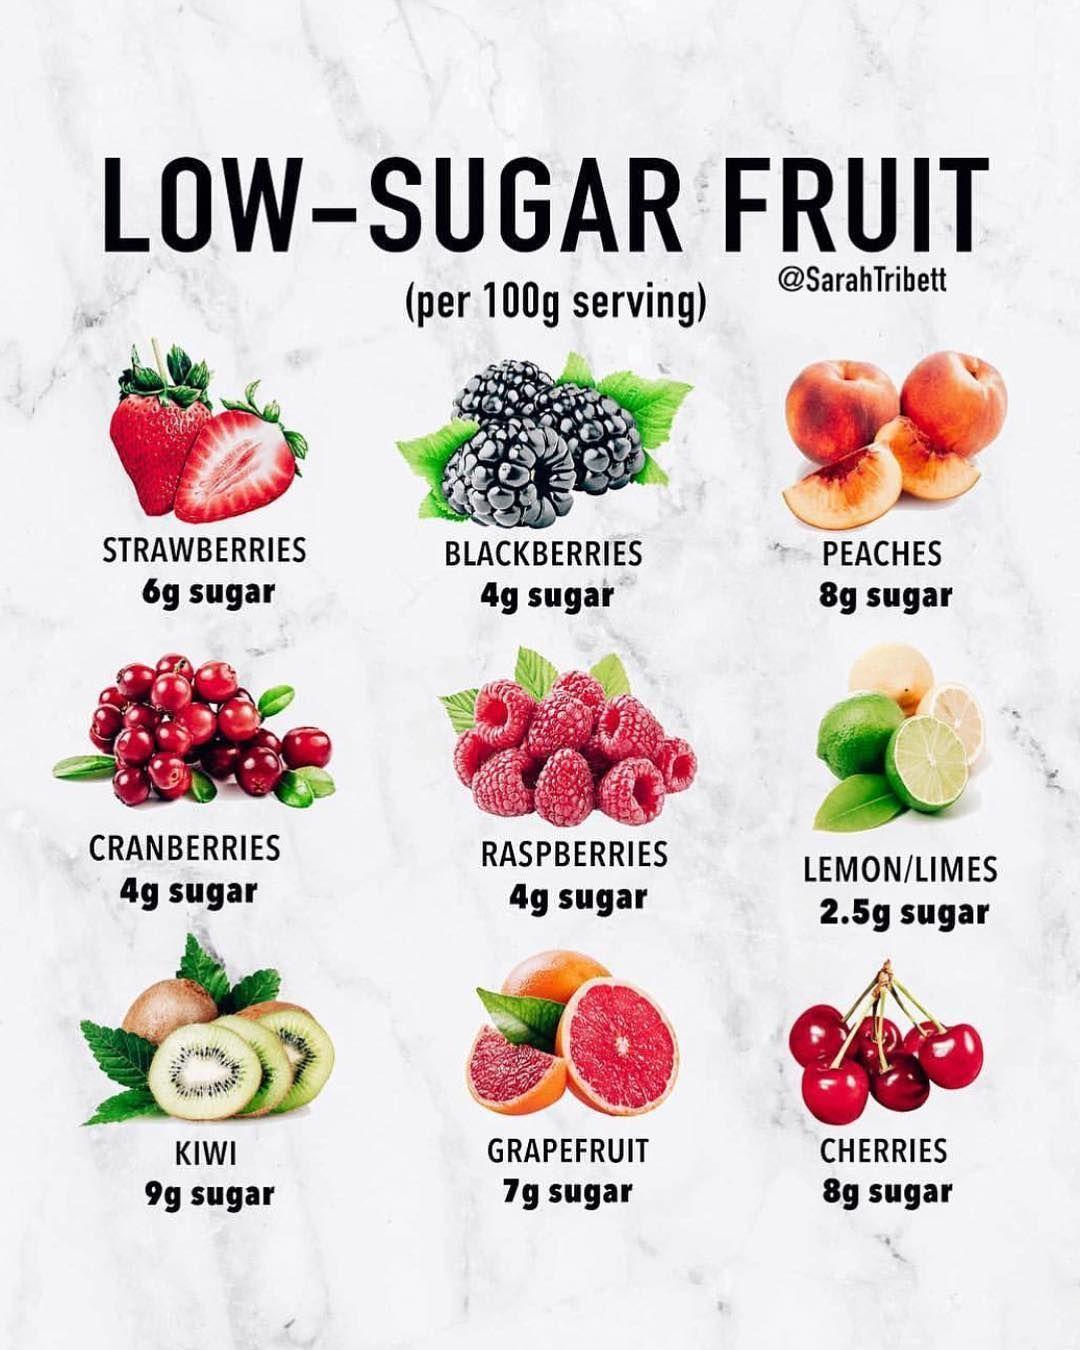 Can You Get Diabetes From Fruit Sugar Pin By Karla Martinez On Spiralizer Recipes Keto Fruit For Diabetics Best Fruits For Diabetics Fruits With Low Sugar